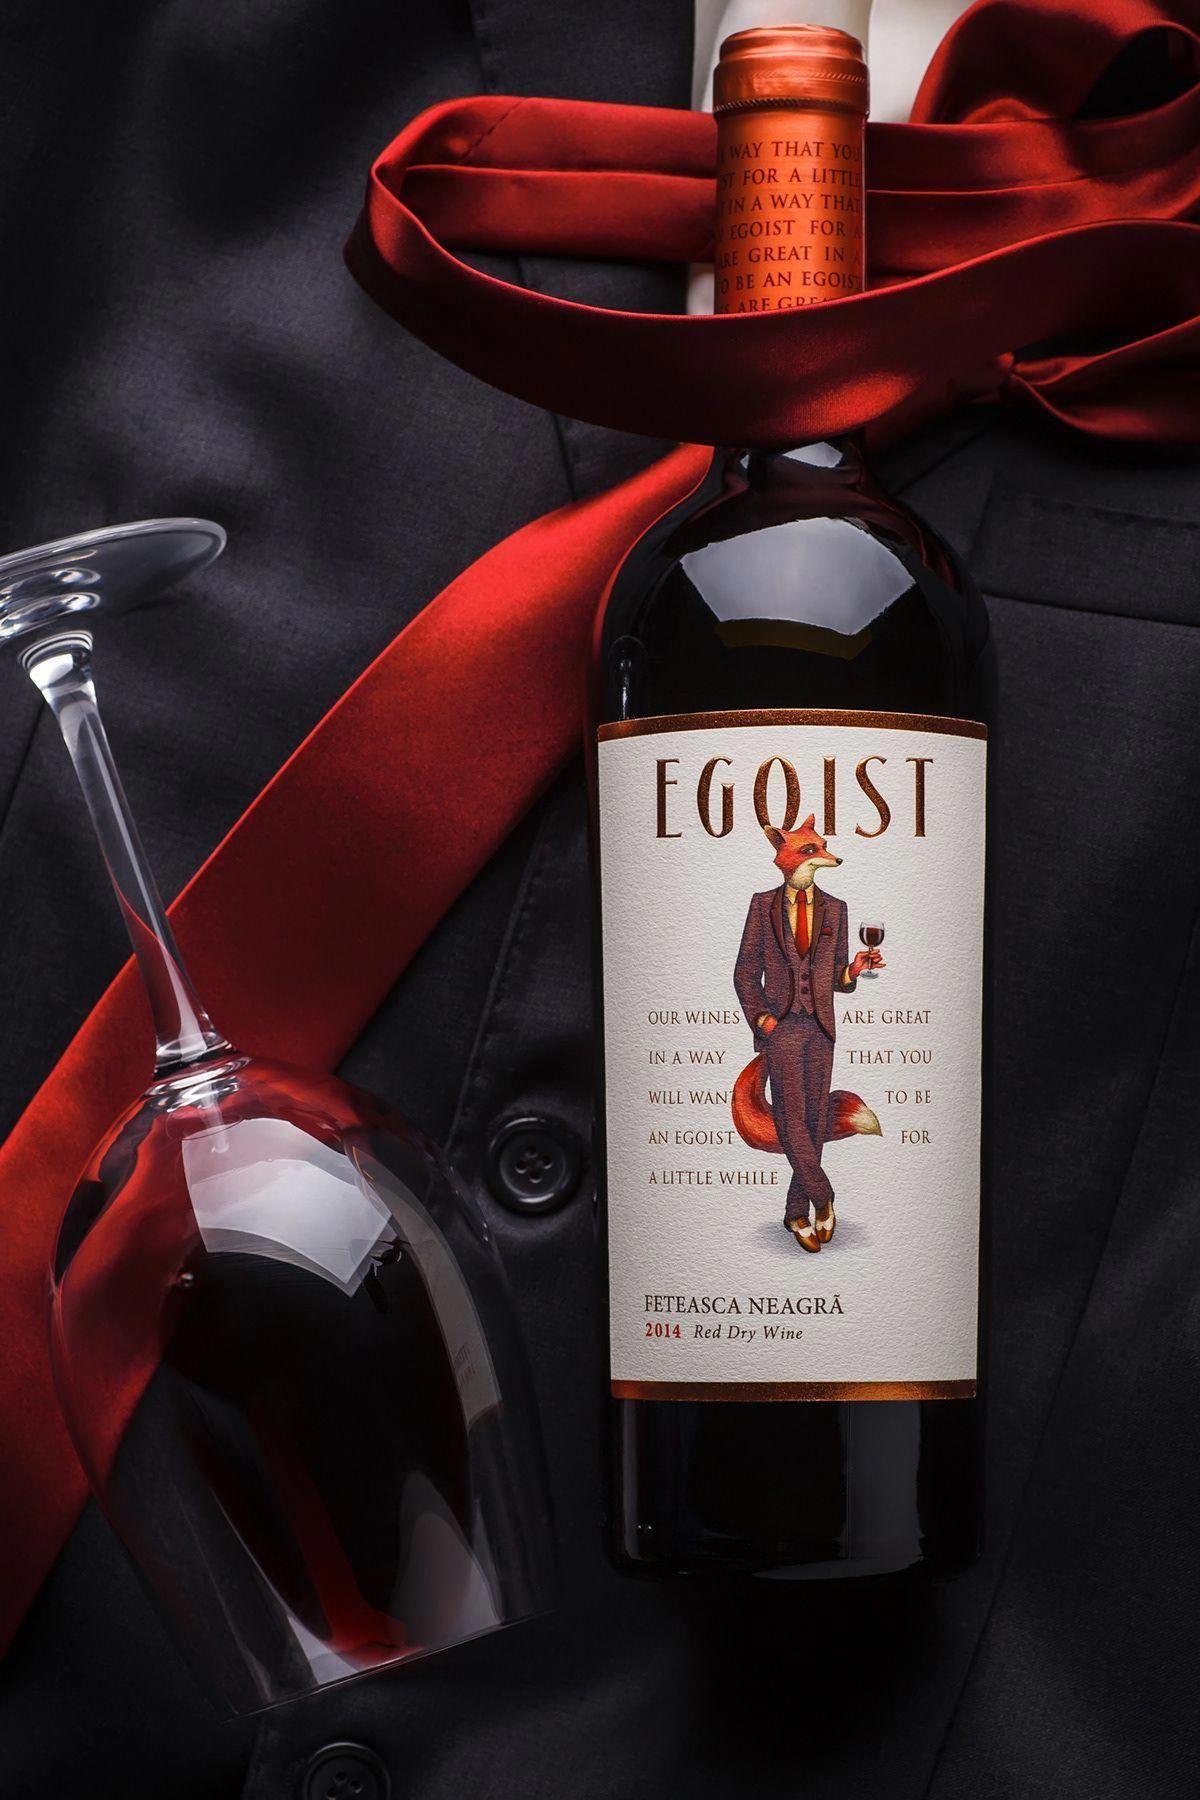 Buy Wine In Bulk Key 6109187312 Dry Wine Wine Label Design Wine Bottle